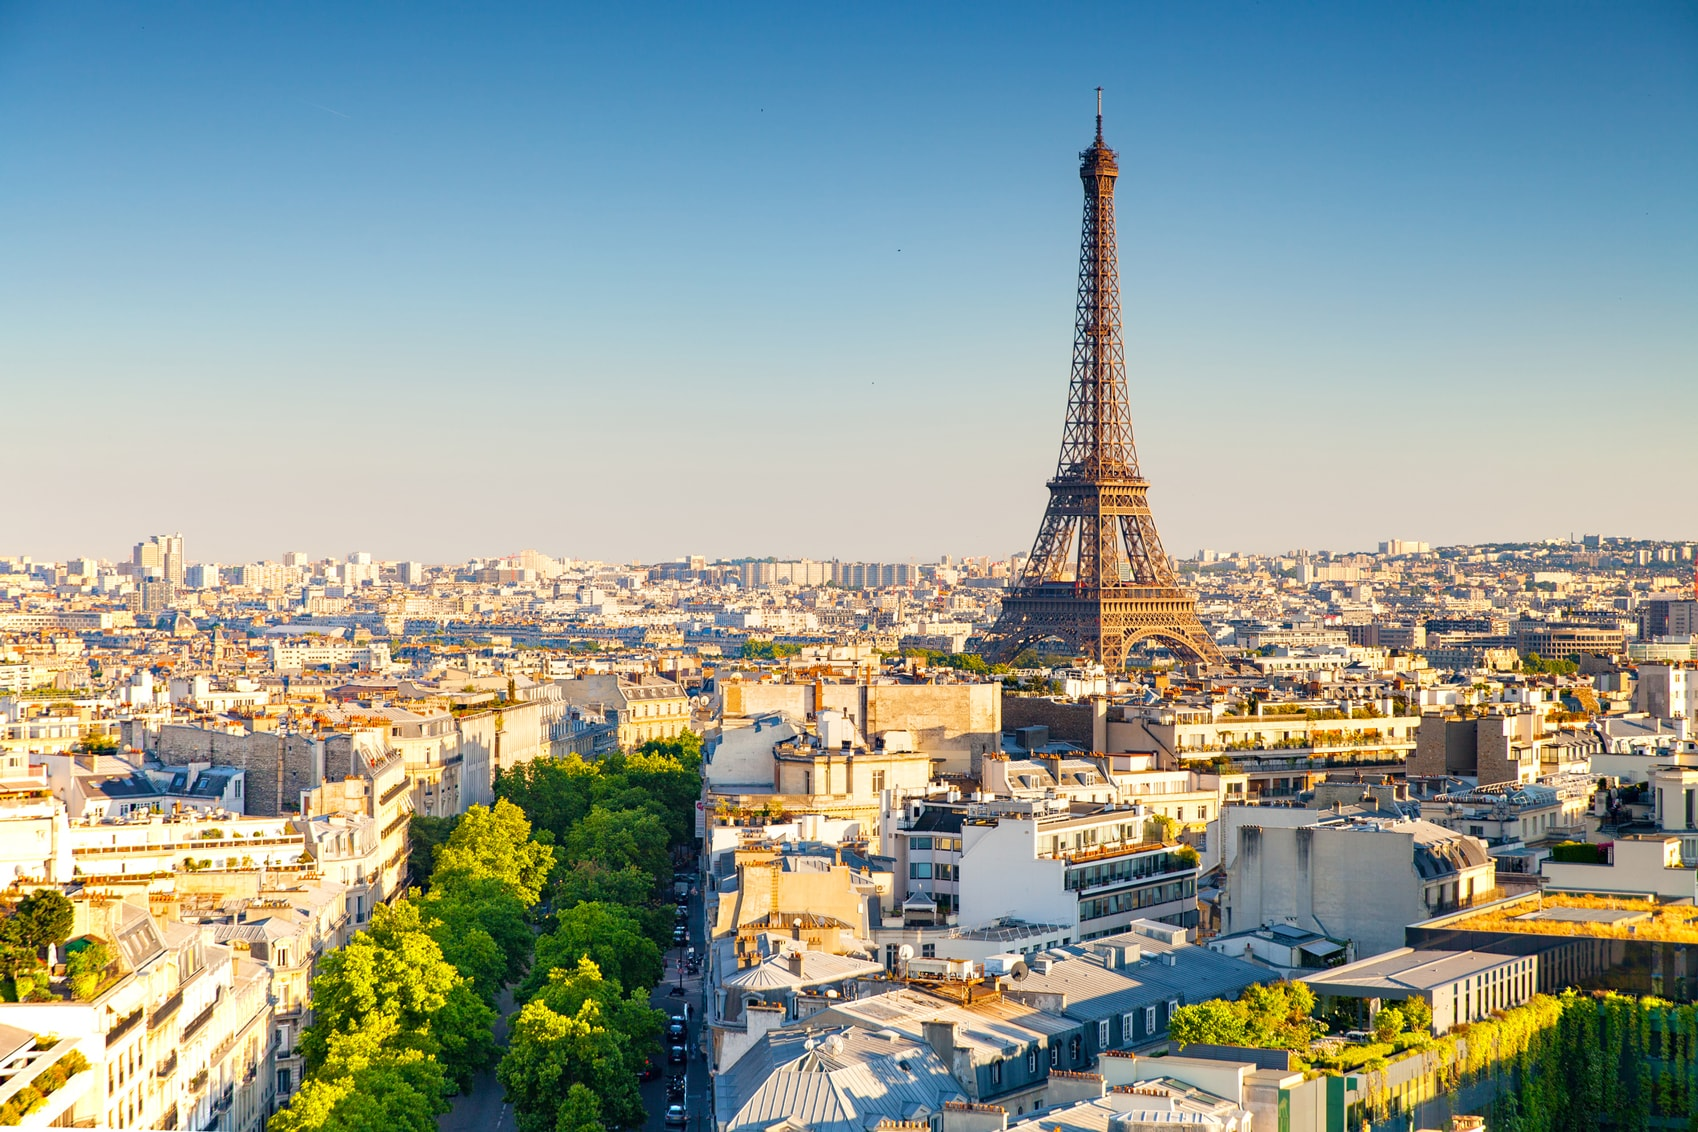 European Cities to Visit Paris-www.istockphoto.com_gb_photo_cityscape-of-paris-by-the-sunset-gm604371970-103792411-Sean3810